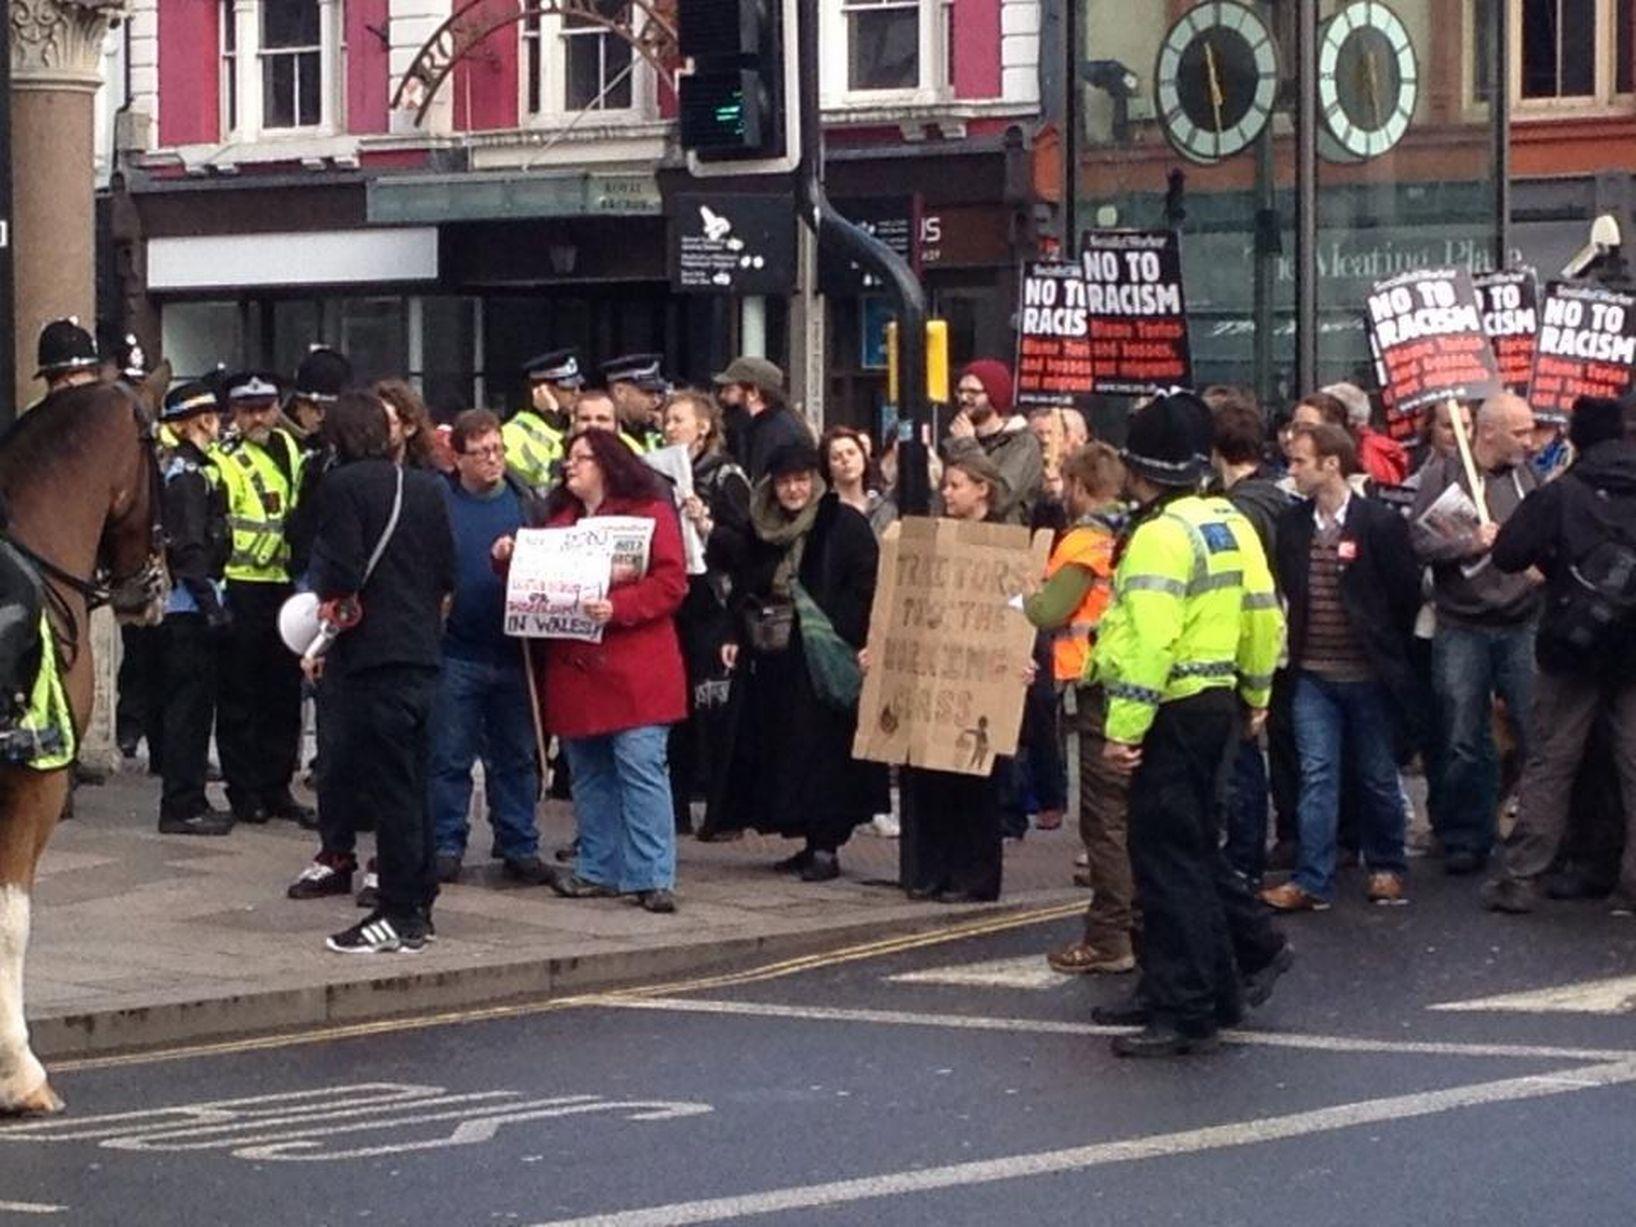 Cardiff anti-fascist protest